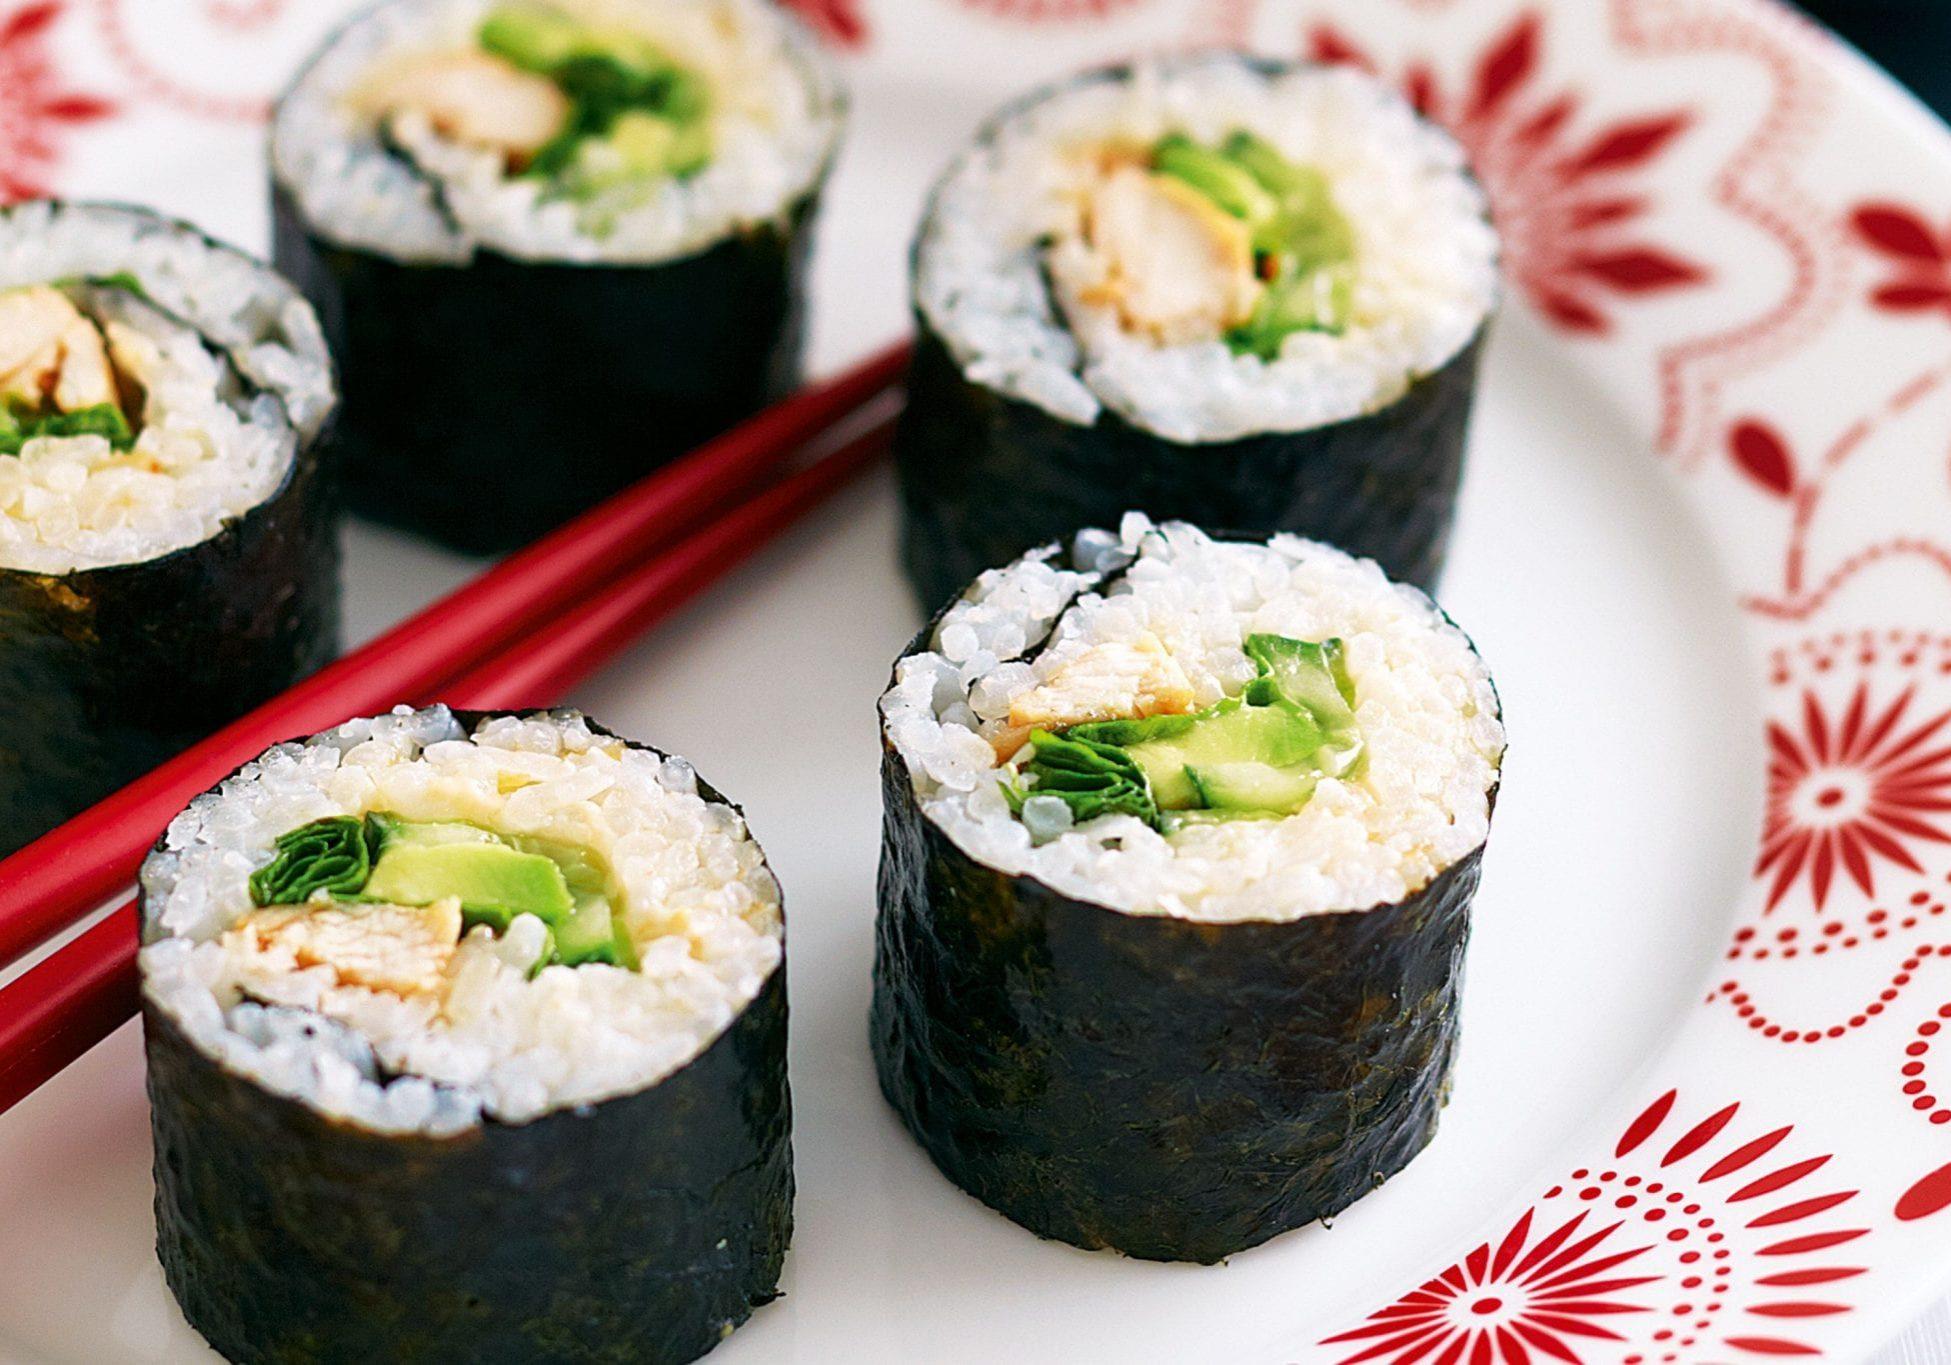 Making sushi together